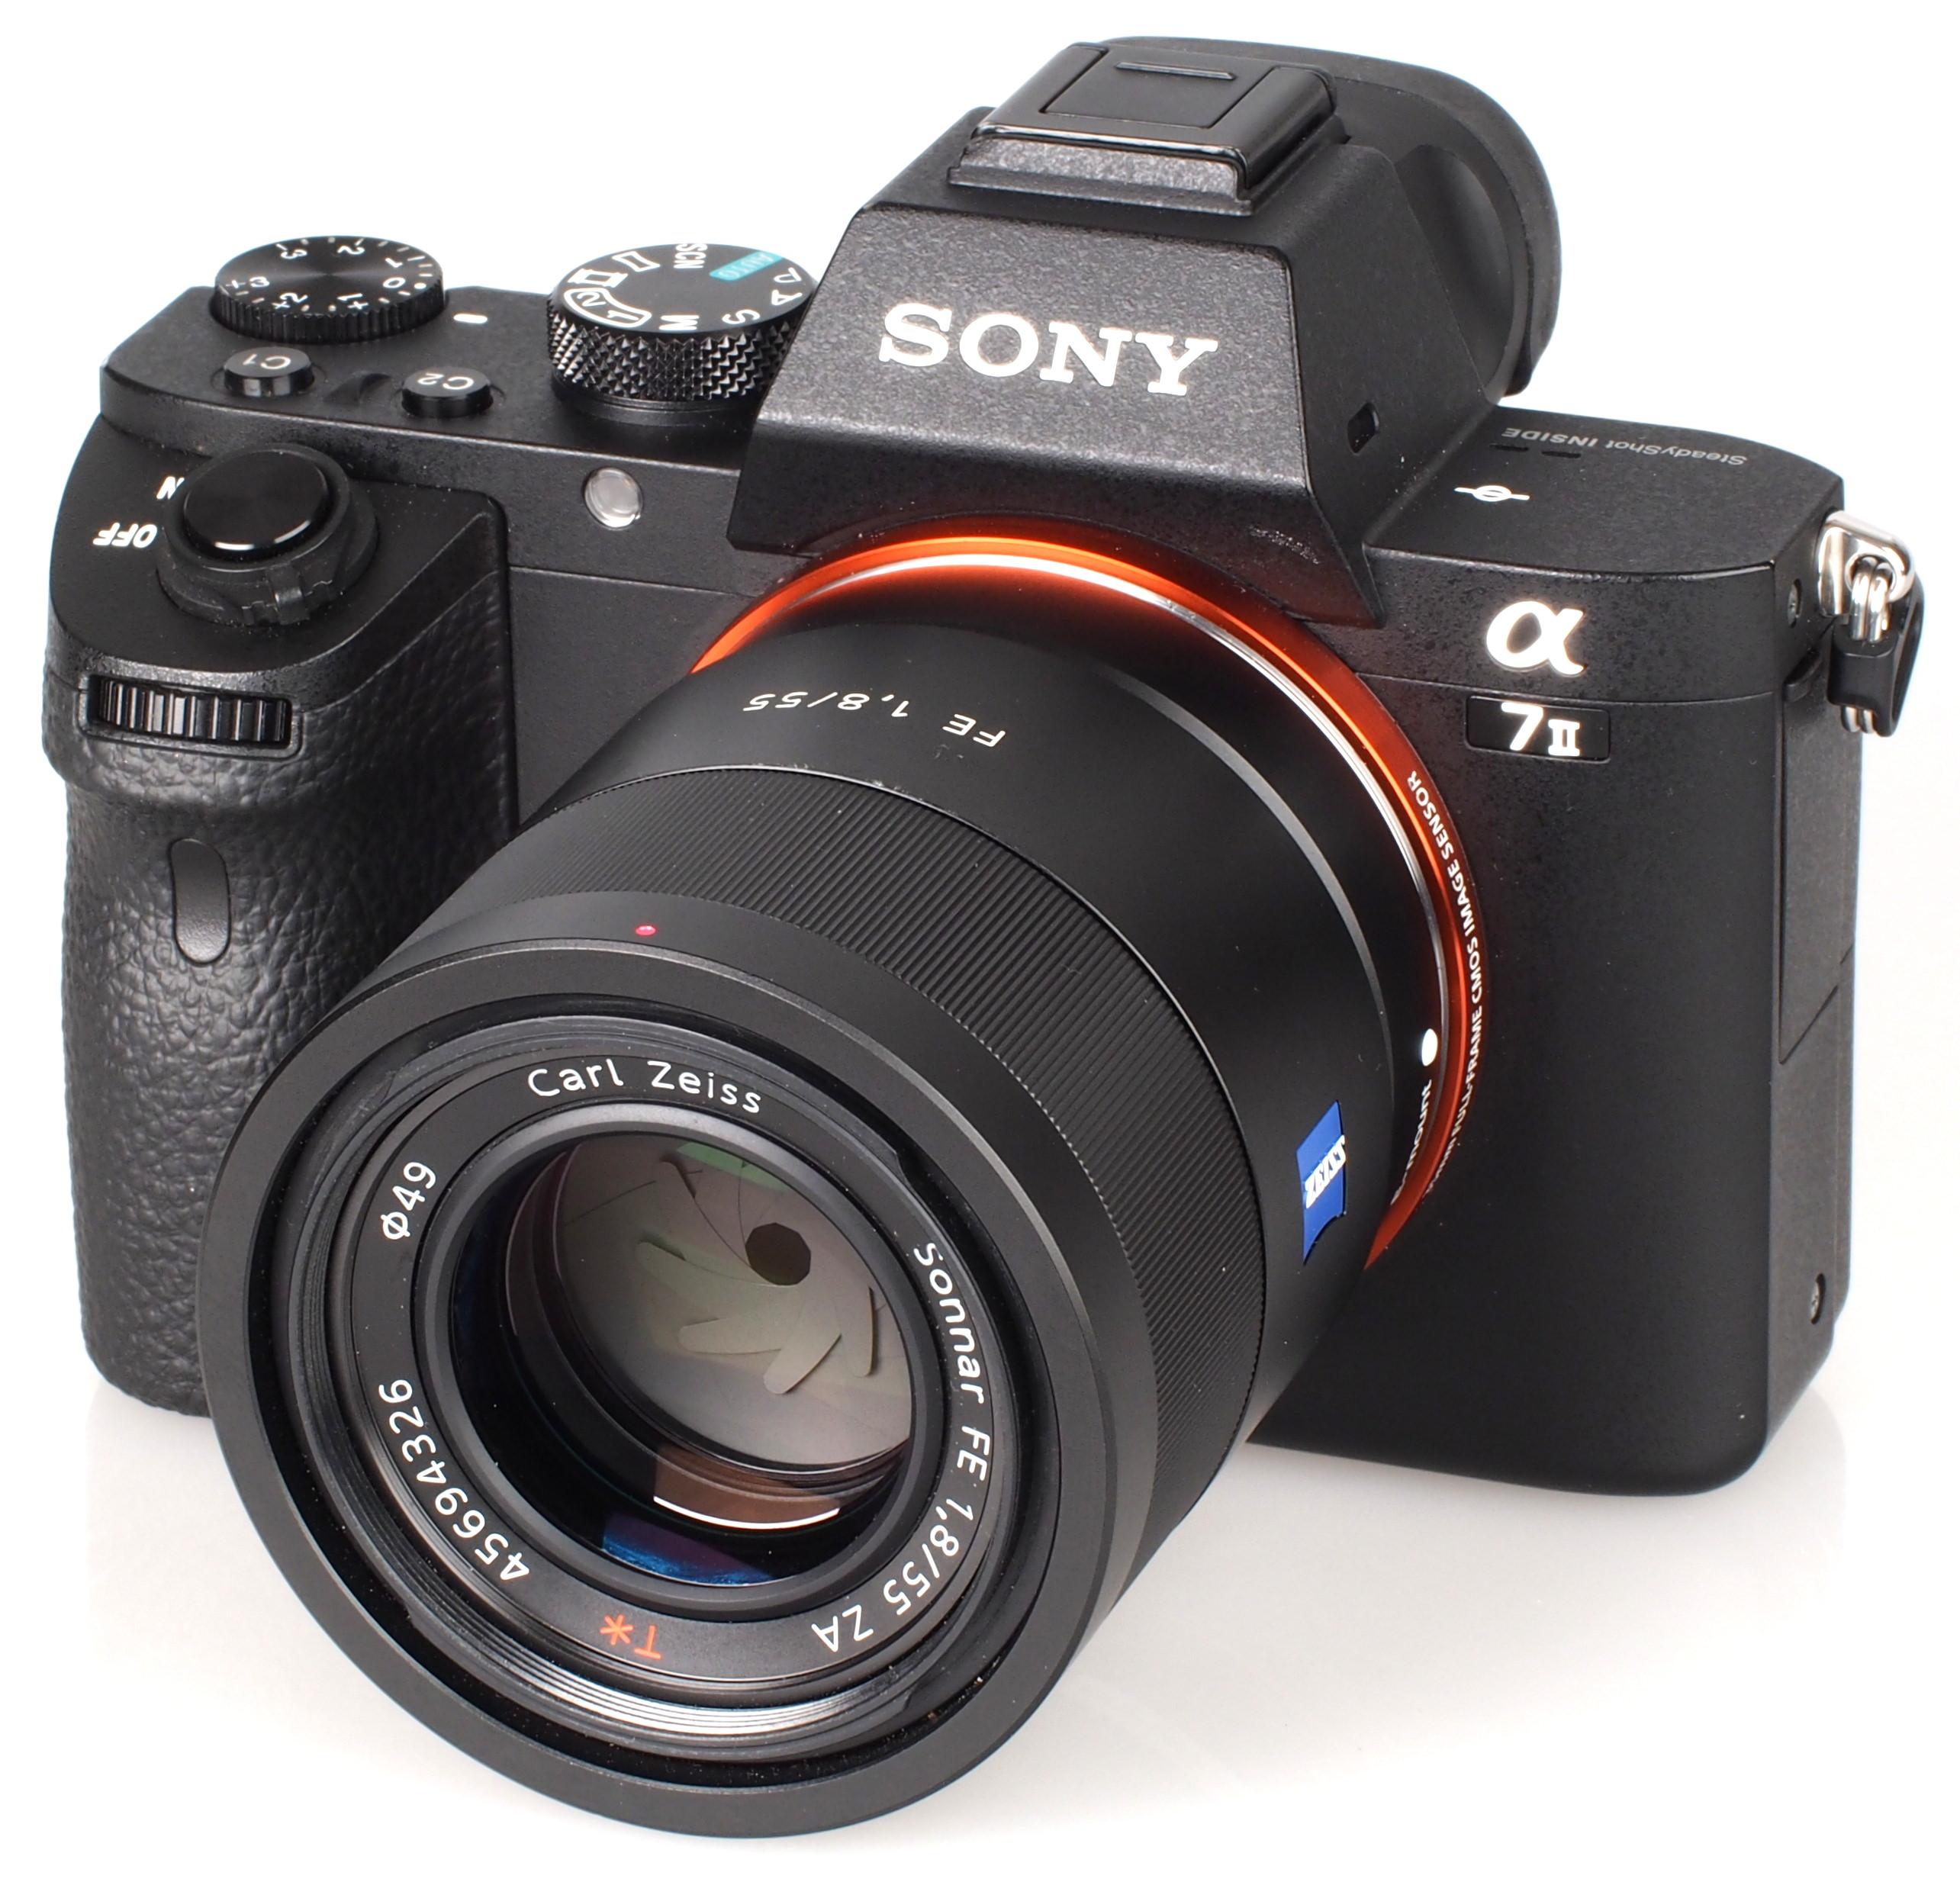 Sony Alpha A7 Ii Uncompressed Raw Firmware Update V20 La Ea3 Mount Adapter A7ii 3